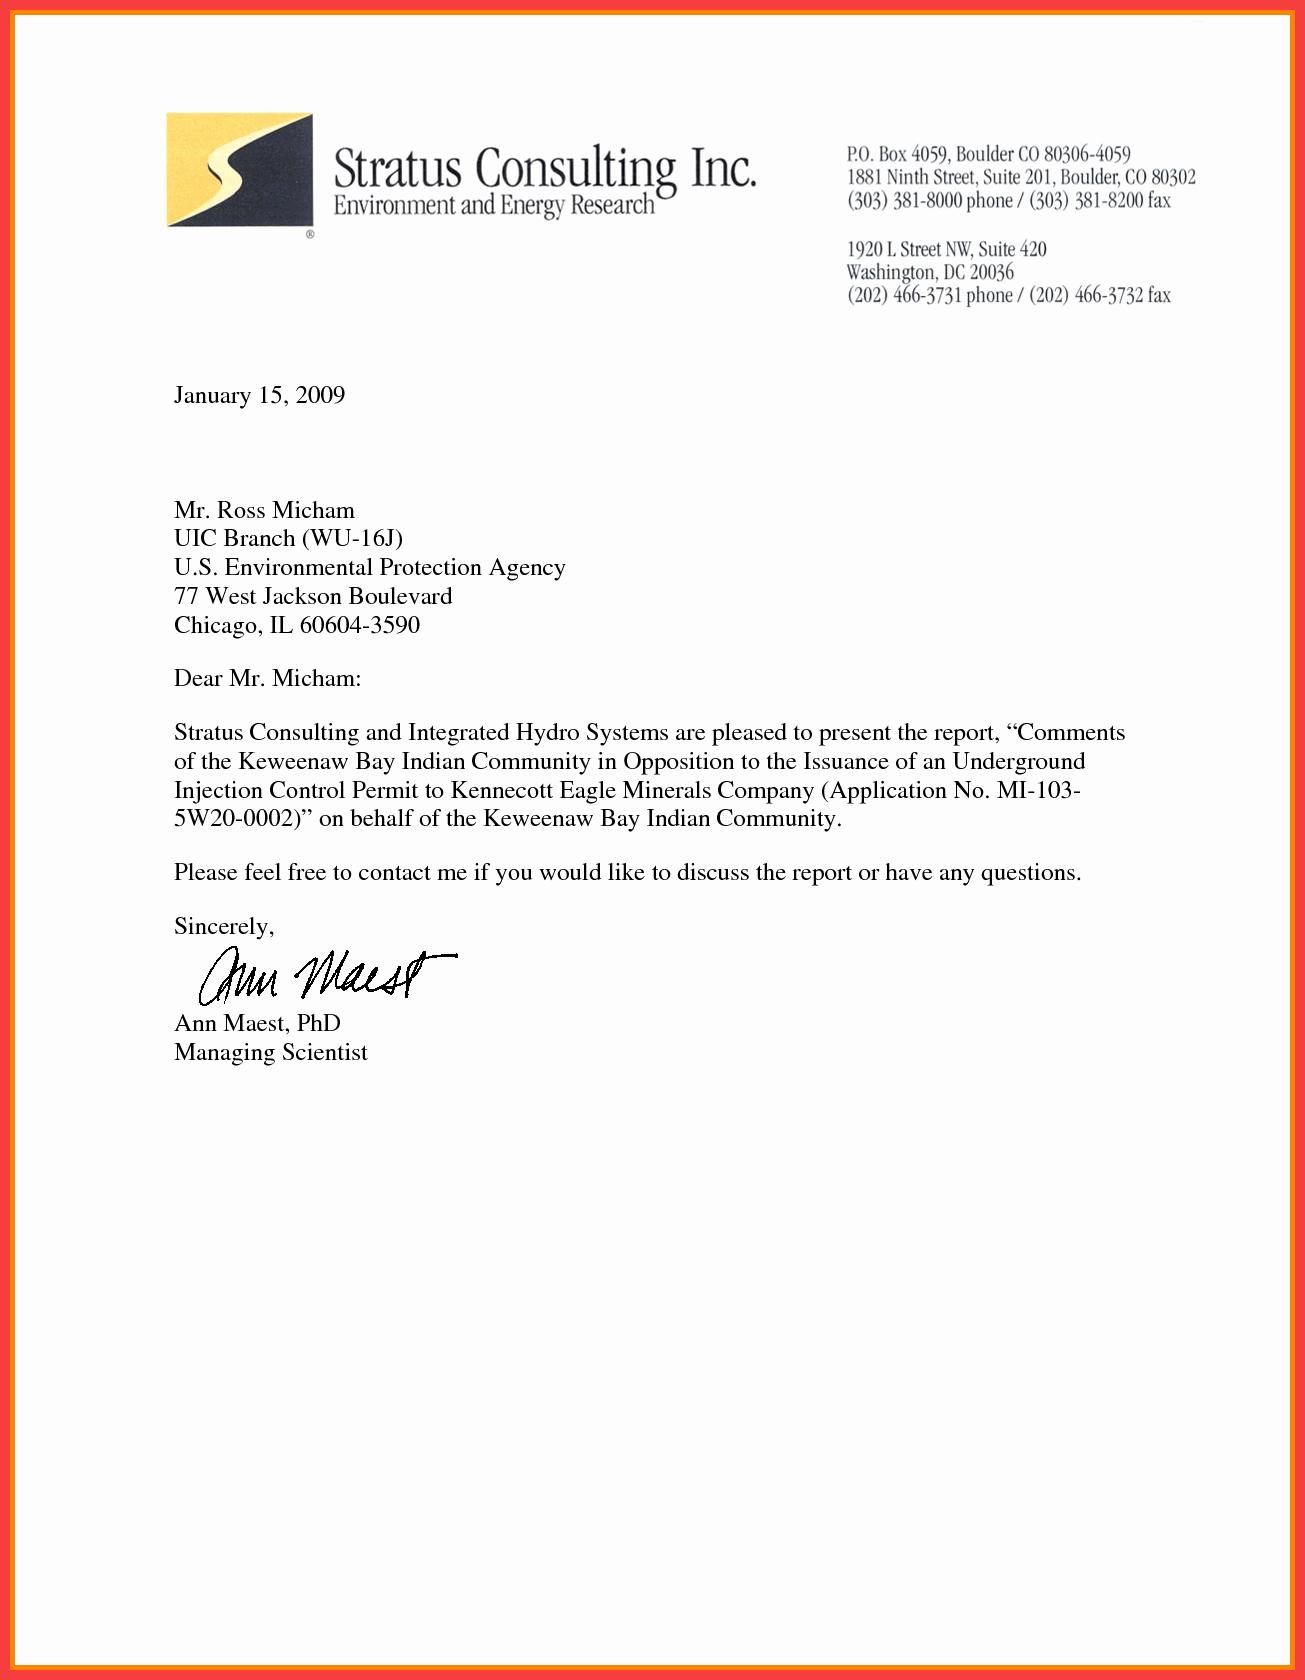 Free Download Business Letter Template Unique Professional Letter Outline